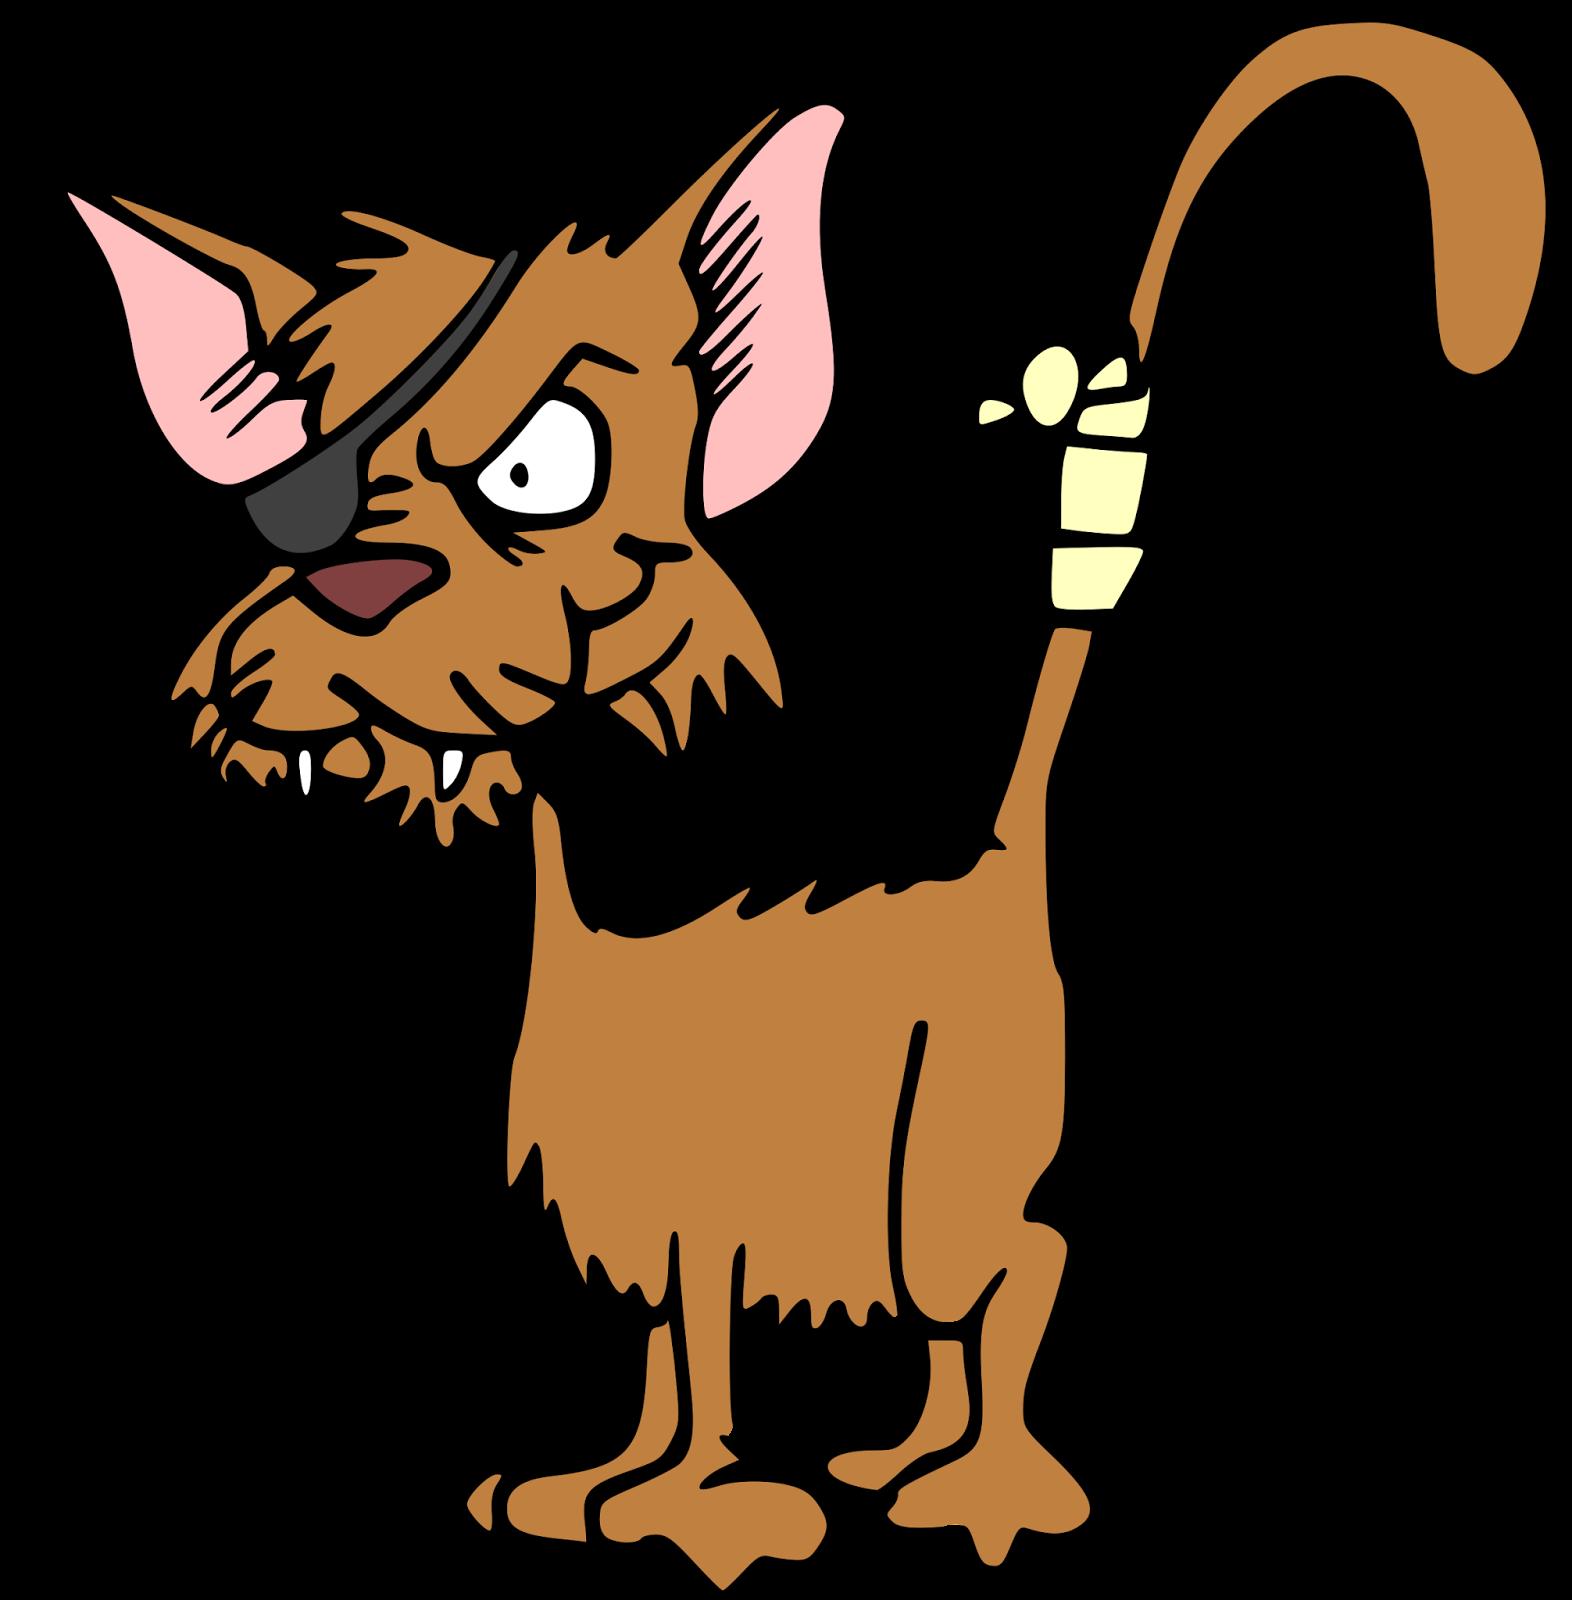 Pirate cat head fishbone body clipart image free Free Pirate Cat Cliparts, Download Free Clip Art, Free Clip Art on ... image free